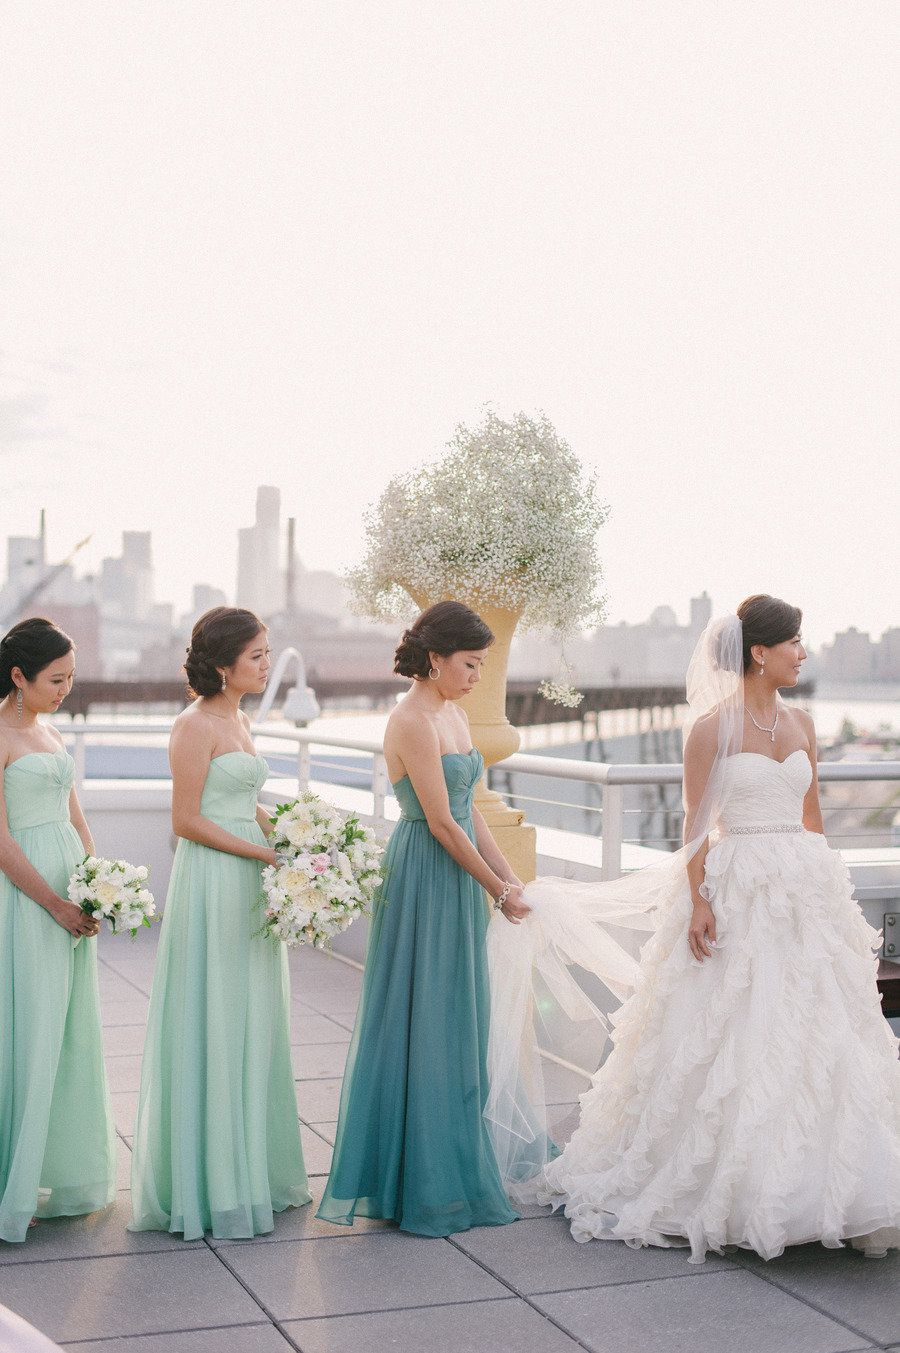 Brooklyn wedding from judy pak photography maids